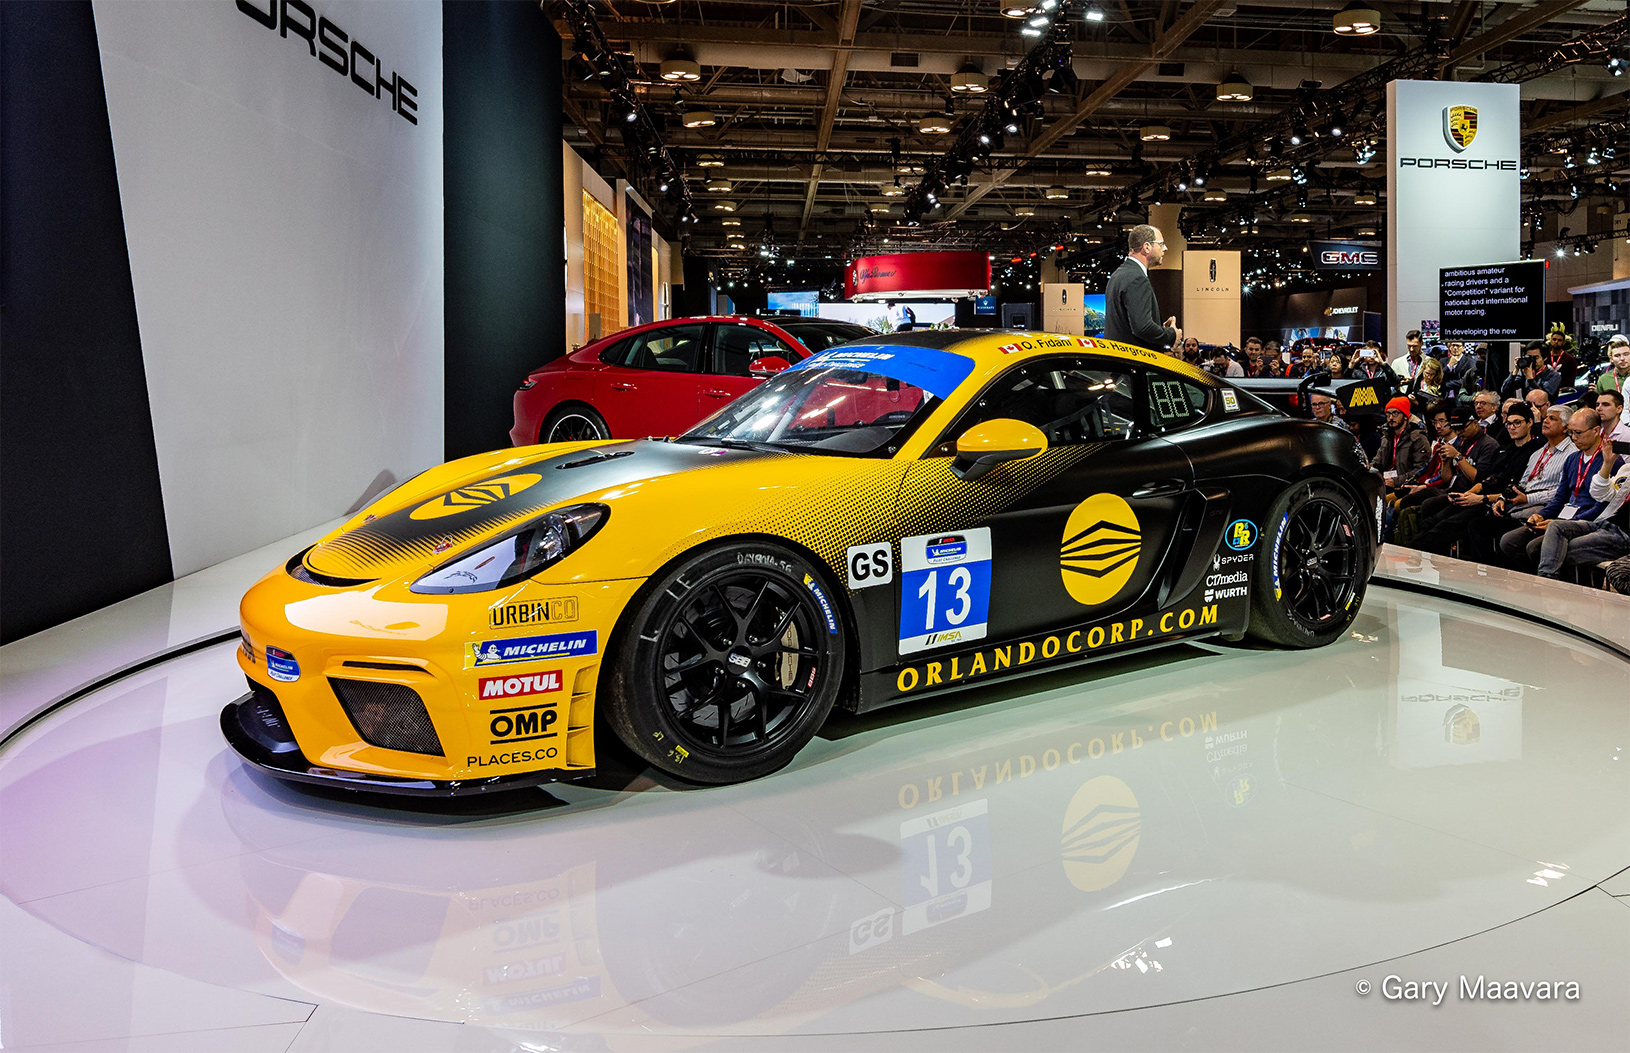 TrackWorthy - CIAS_Porsche 718 Cayman GT4 Clubsport (3)